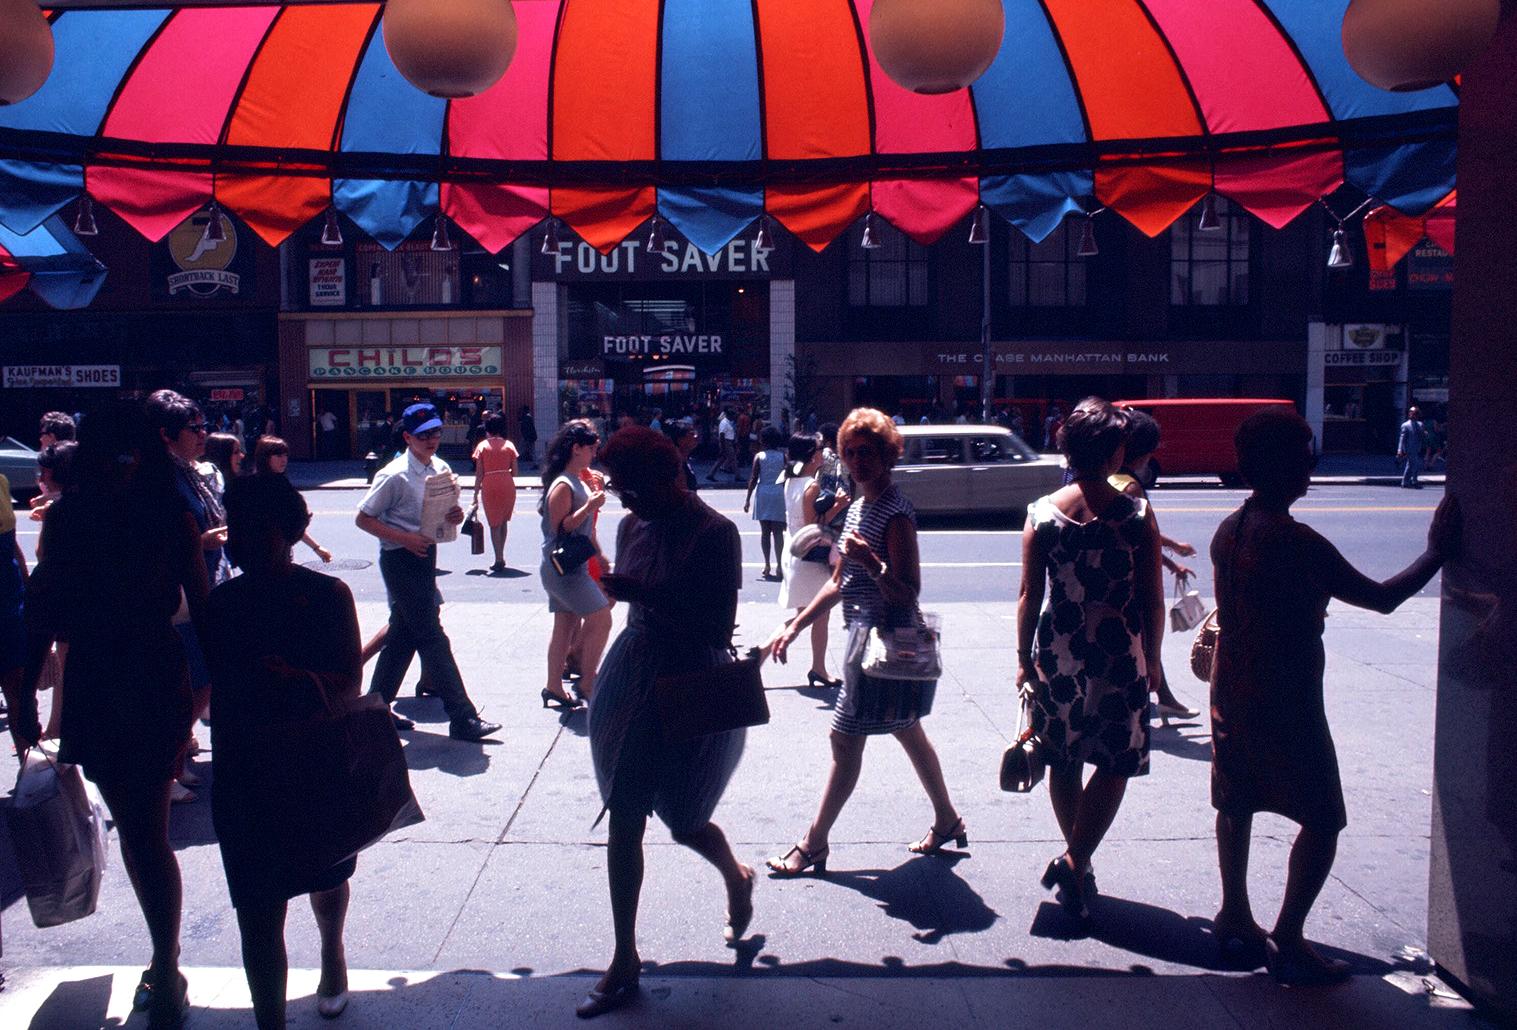 Dan-Wynn_Street-Photography-Still-Life_2-1-87_0001.jpg